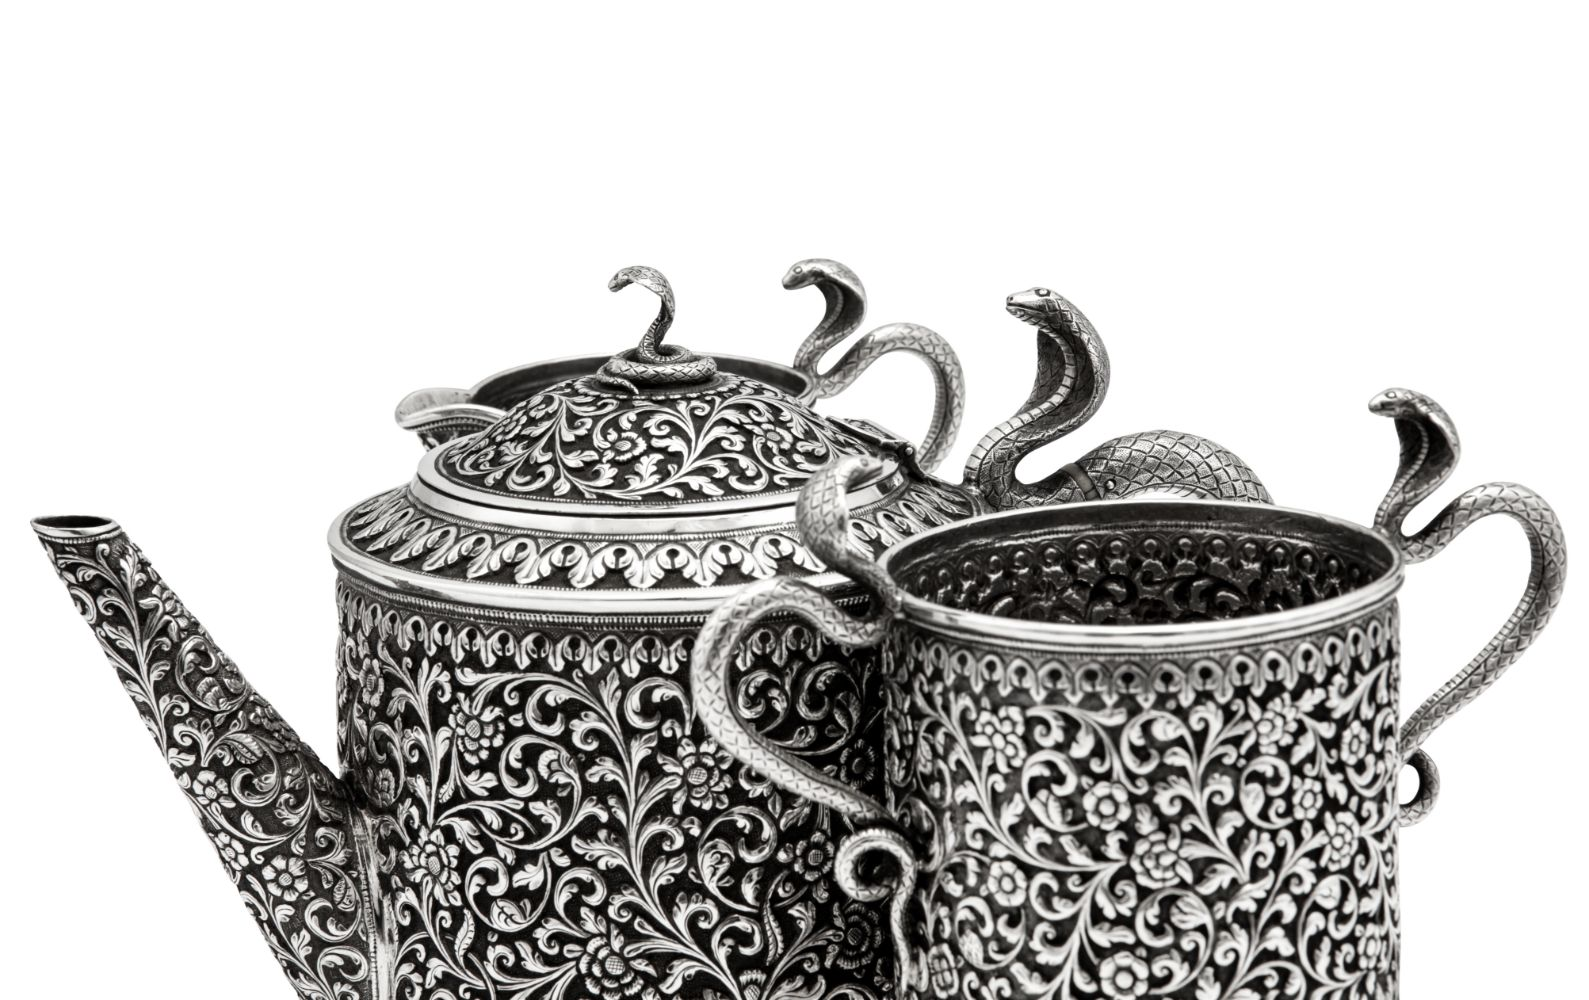 Silver & Objects of Vertu